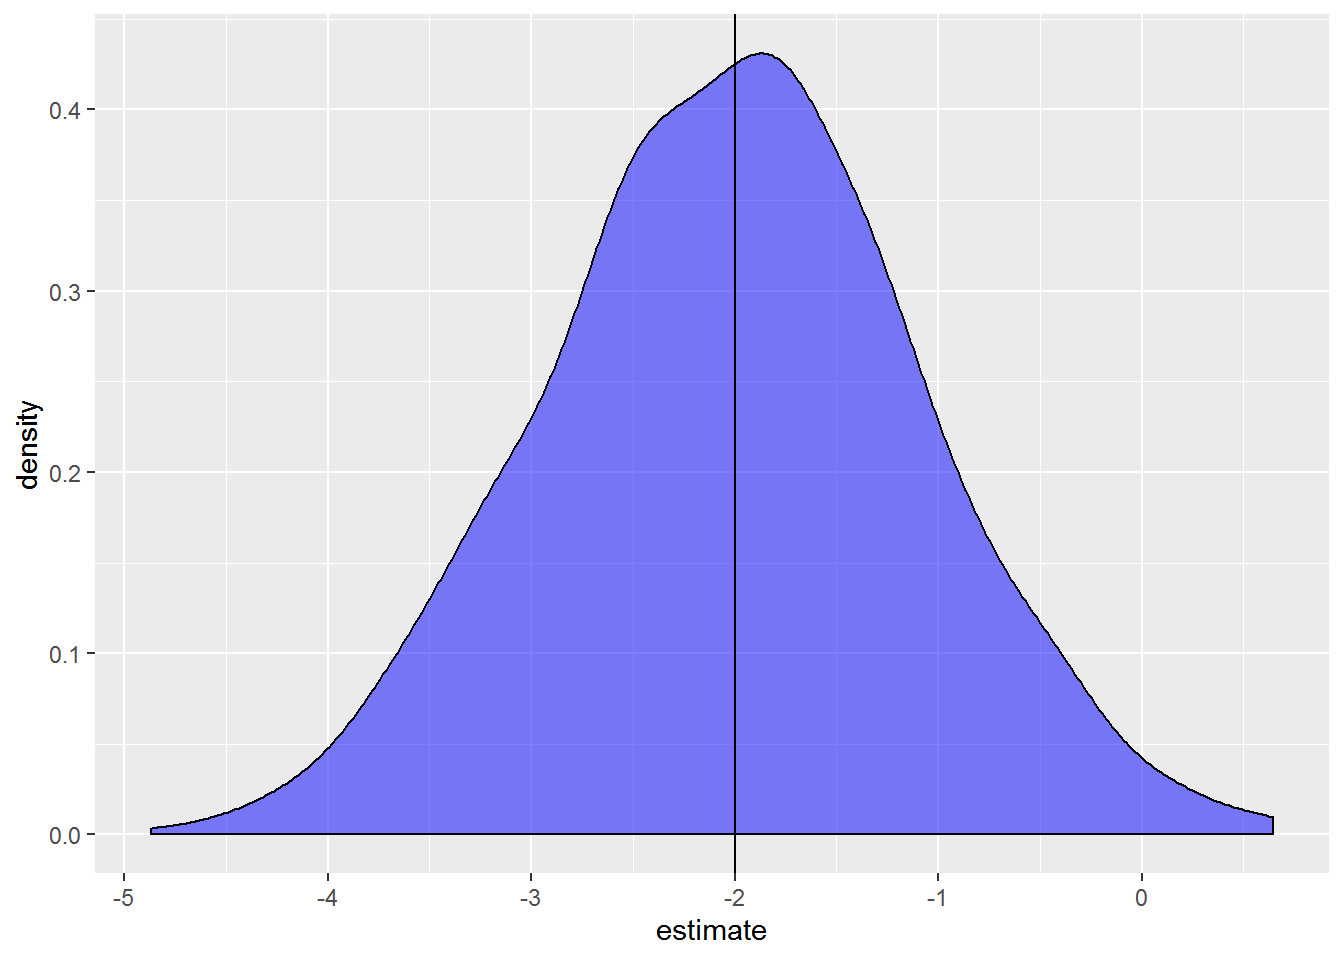 Simulate! Simulate! - Part 1: A linear model